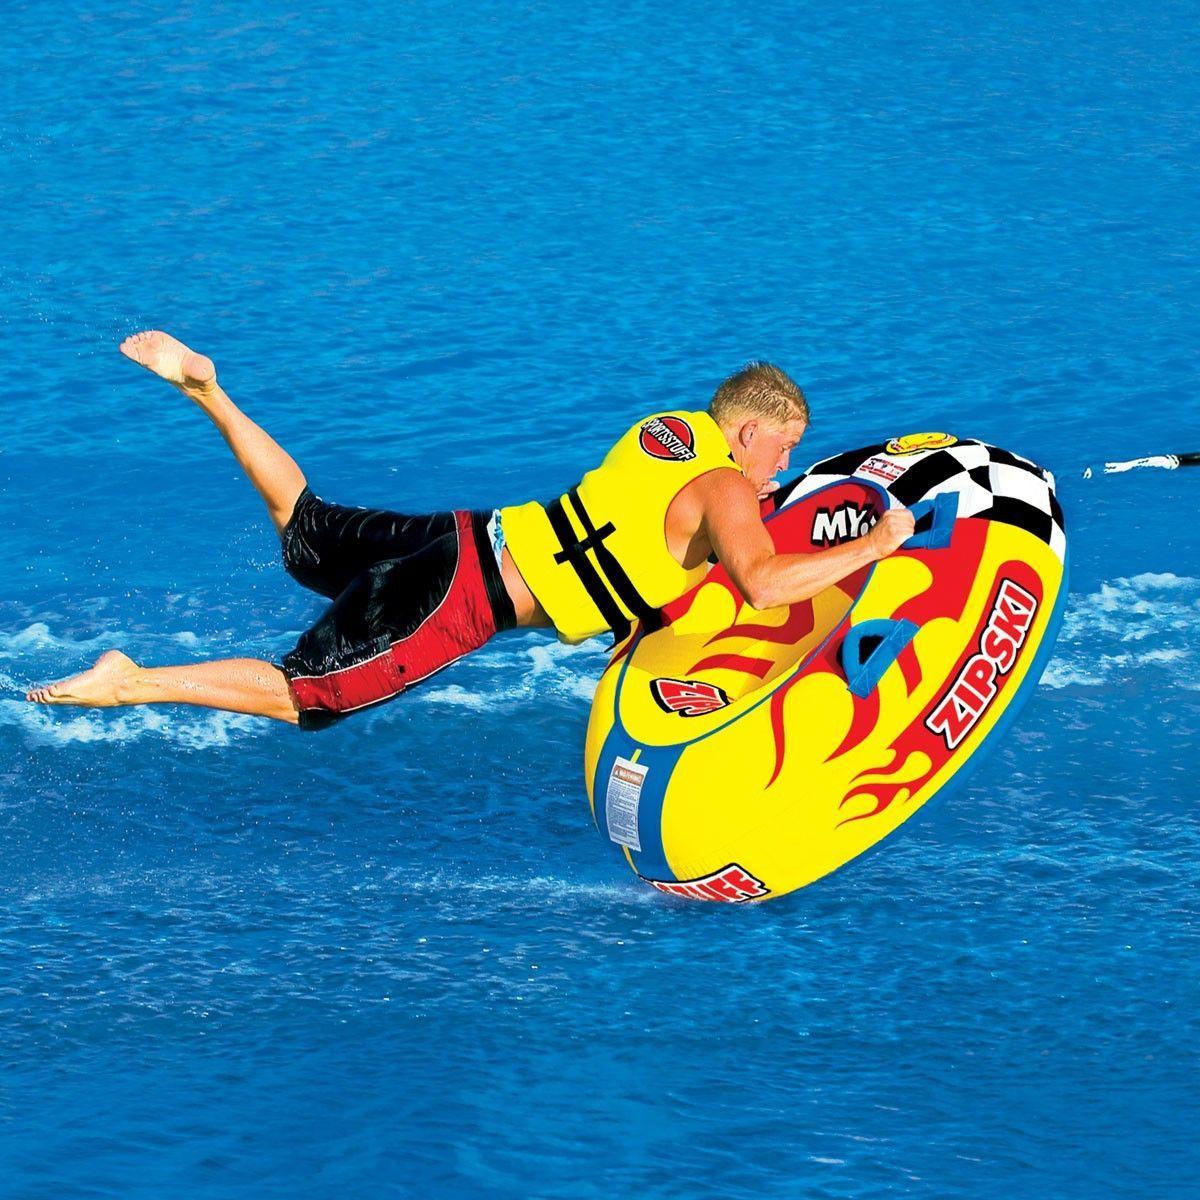 SportsStuff 53-1313 Zip Ski Water Tube